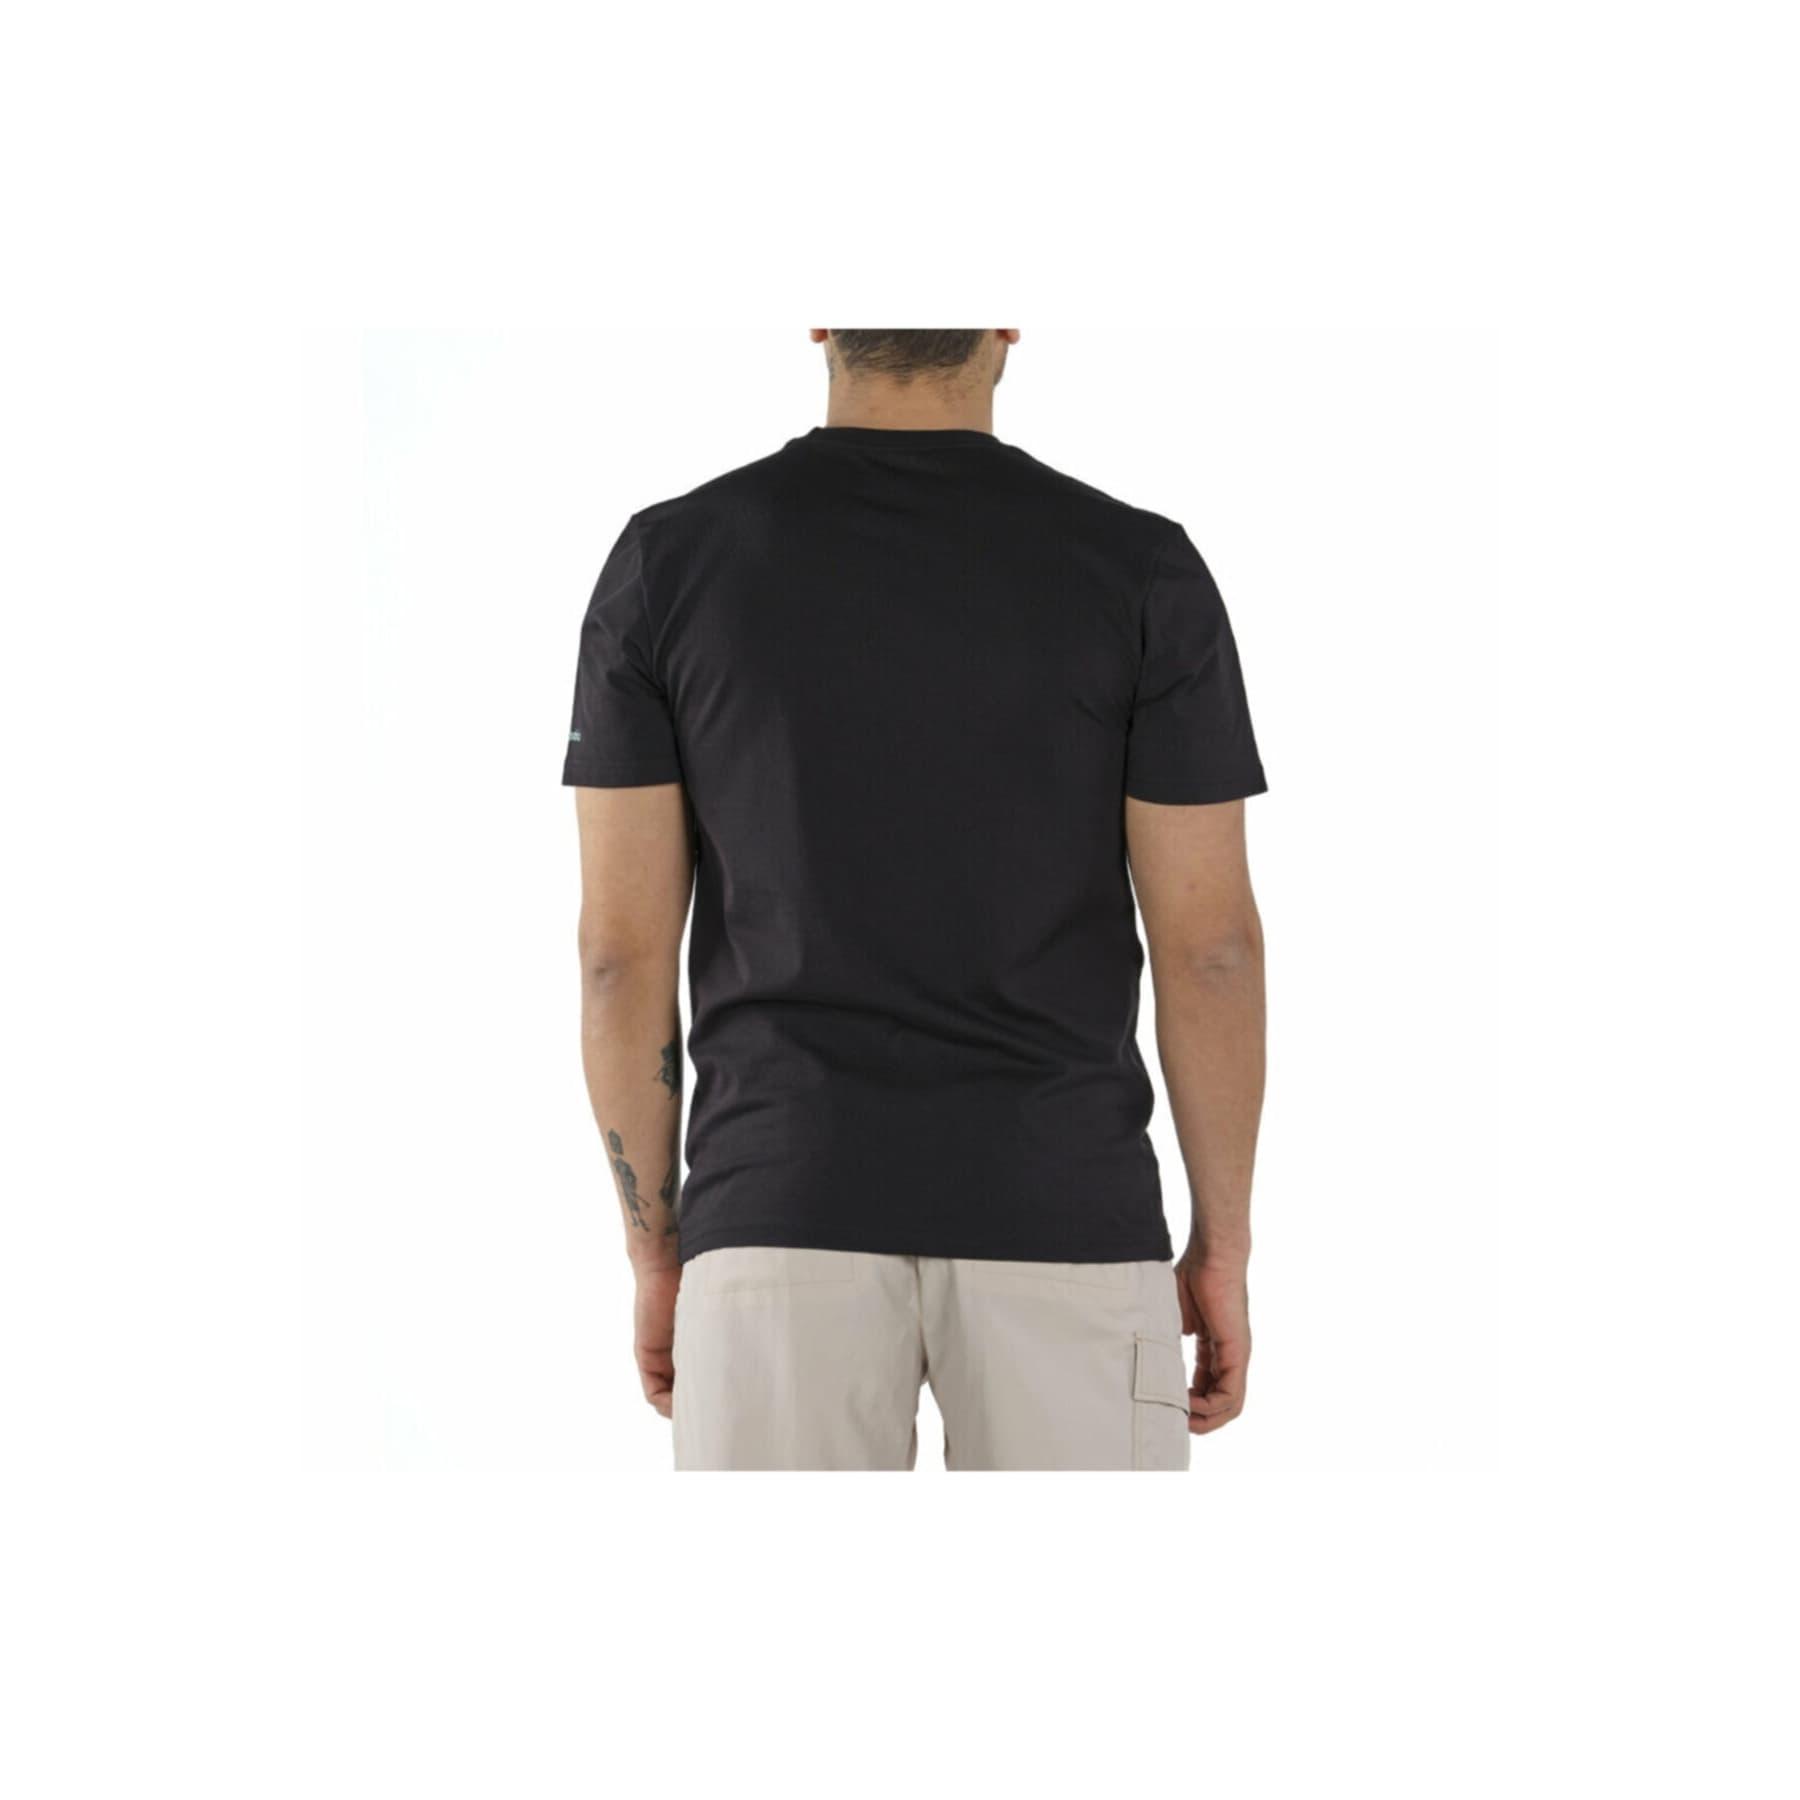 Elevated Outlook Graphic Erkek Siyah Tişört (CS0132_010)